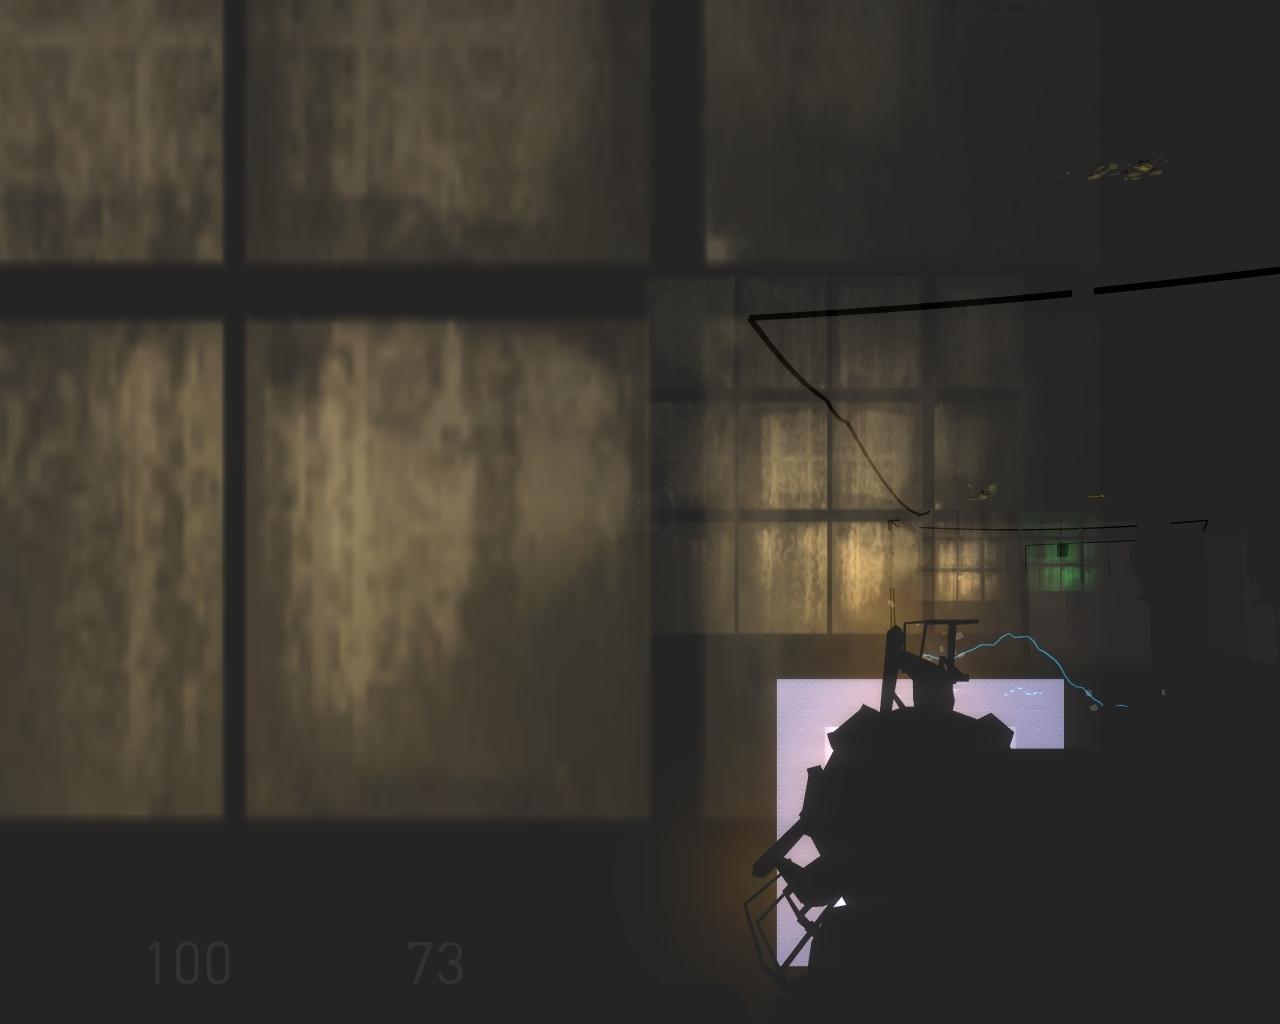 ep1_c17_02a0016.jpg - Half-Life 2